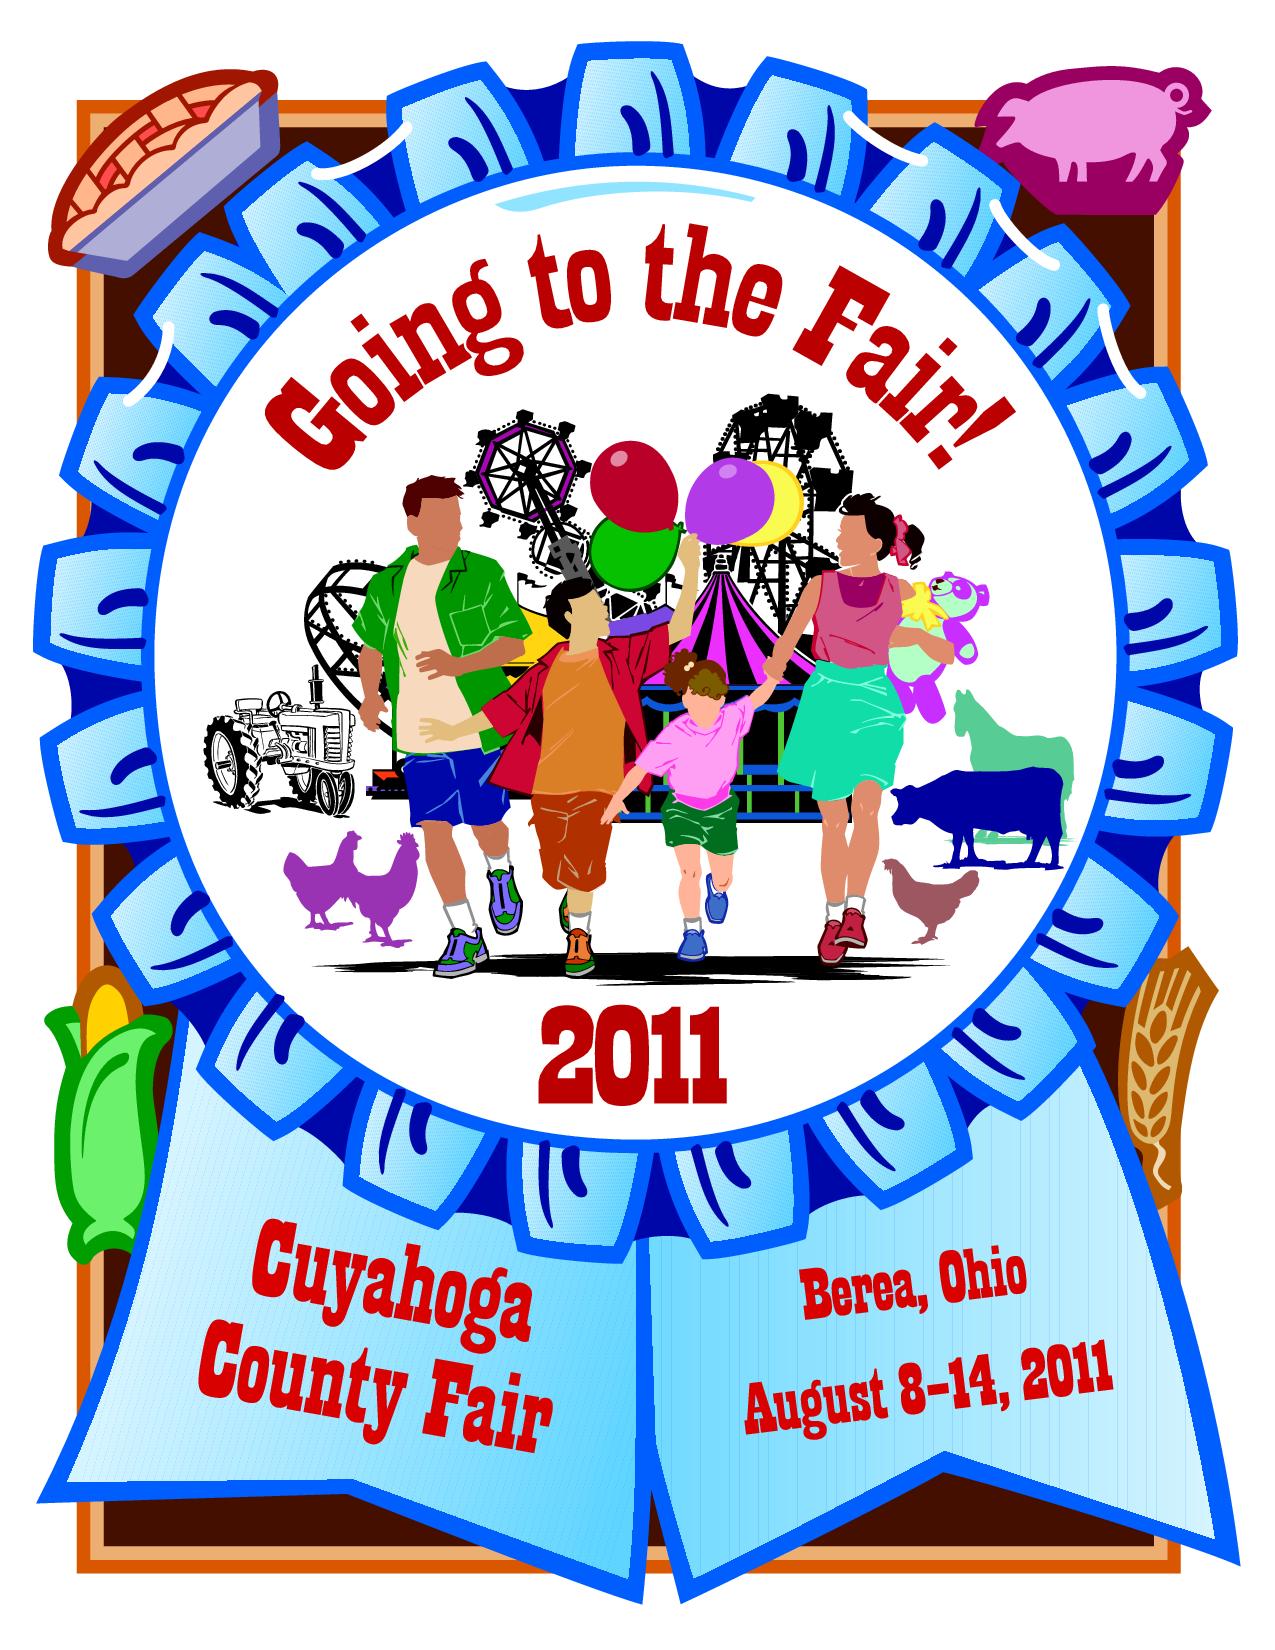 Carousel clipart county fair County Fair cliparts Clipart Fair